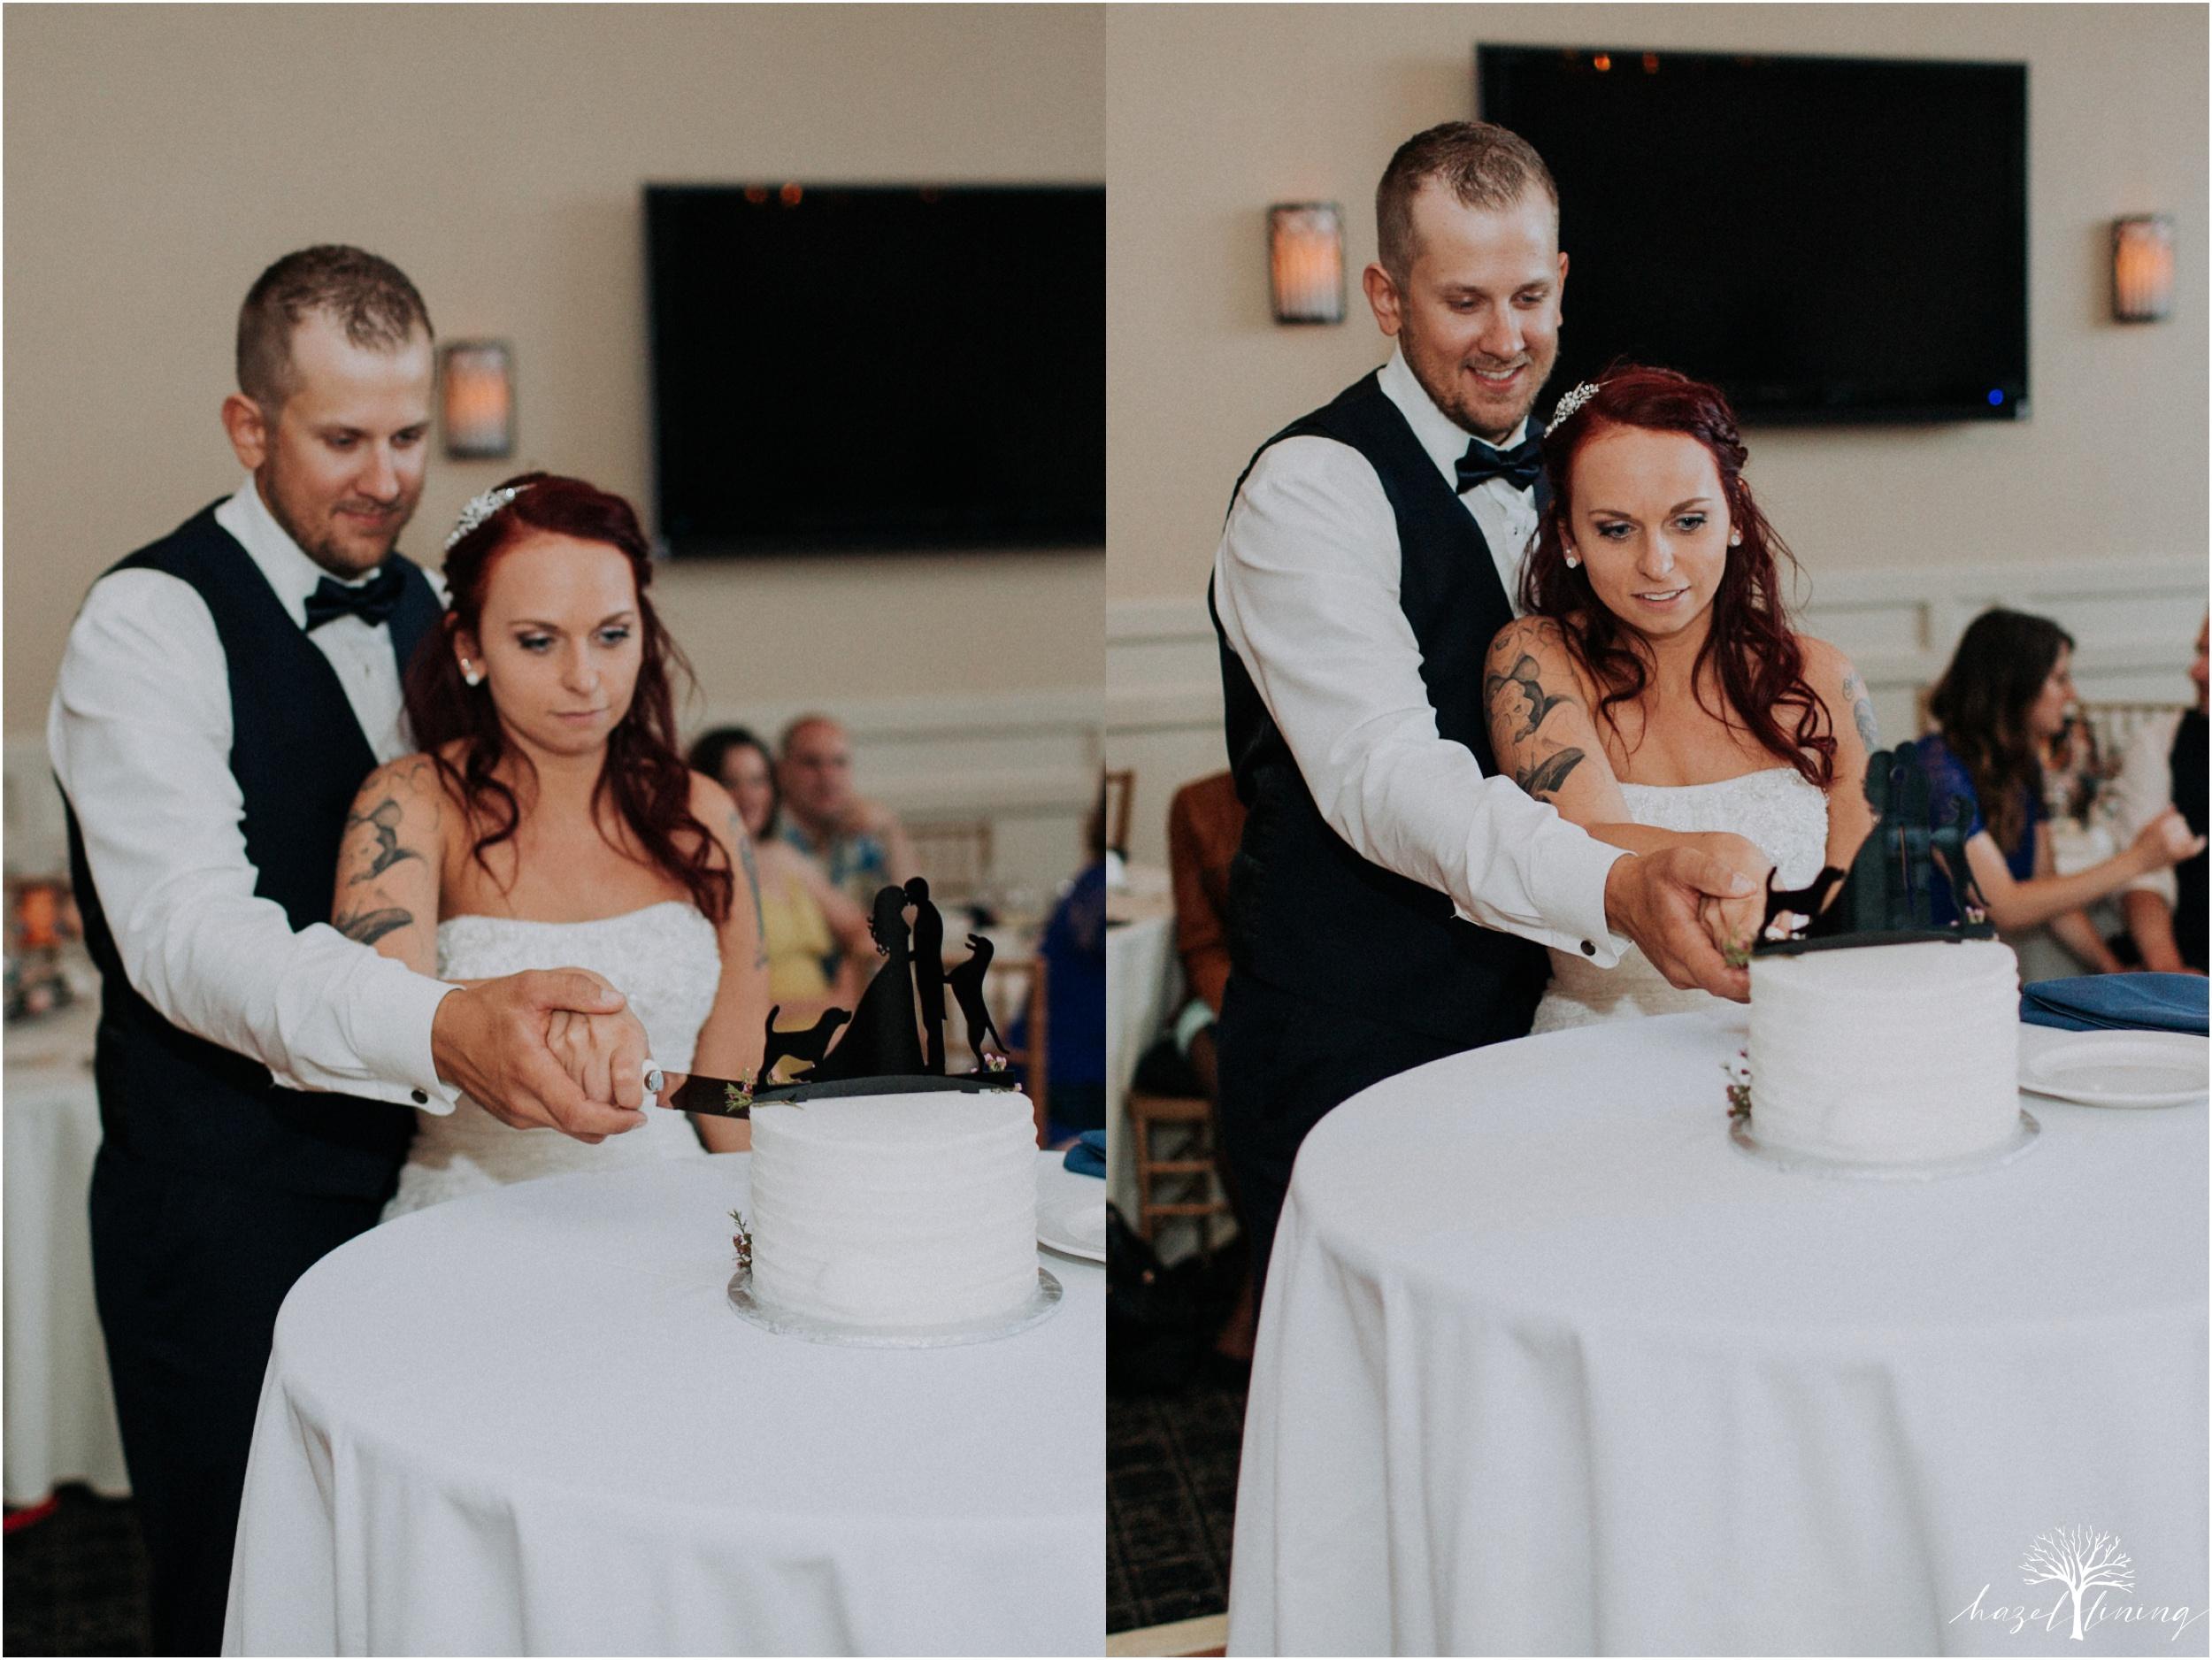 alyssa-james-stiteler-wedding-loft-and-sweet-water-cc-pennsburg-pennsylvania-hazel-lining-travel-wedding-elopement-photography_0143.jpg